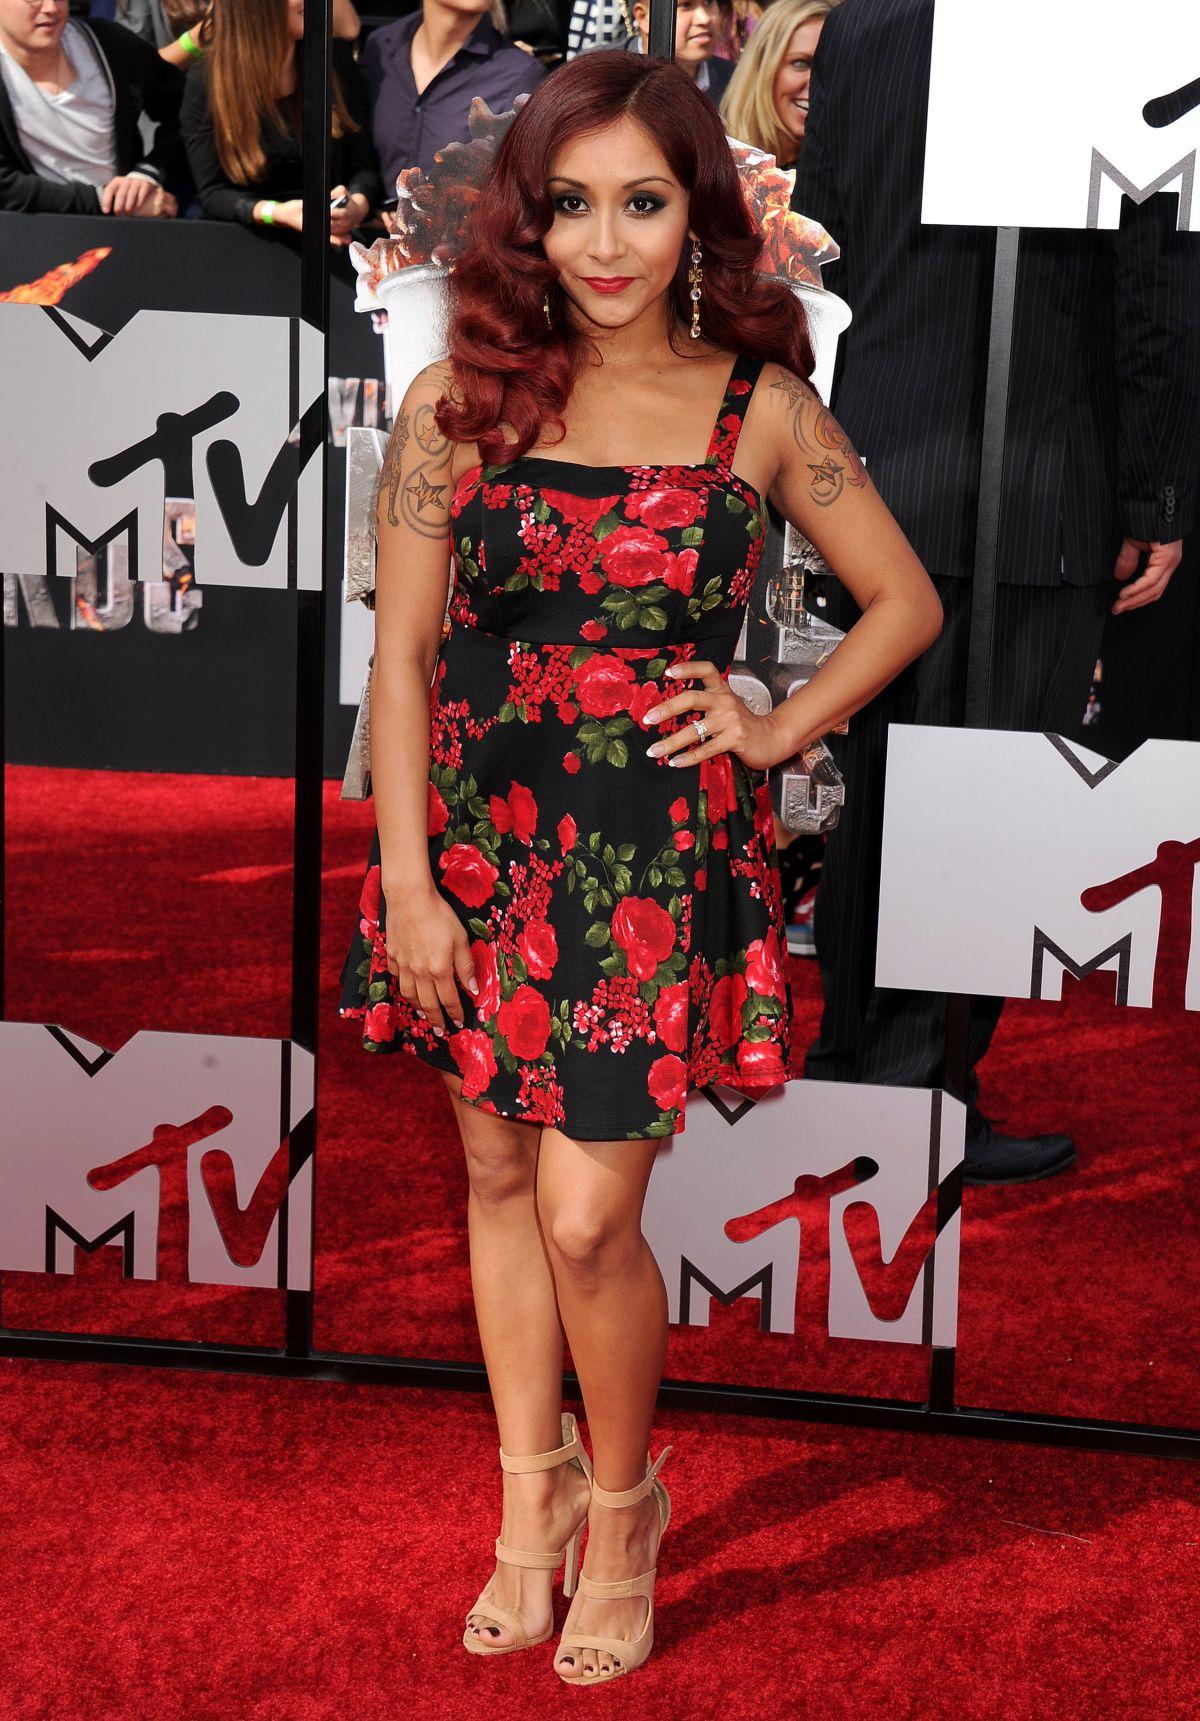 ��� ����� �� ��� ����� ����� 2014 MTV Movie Awards �� ��� ������